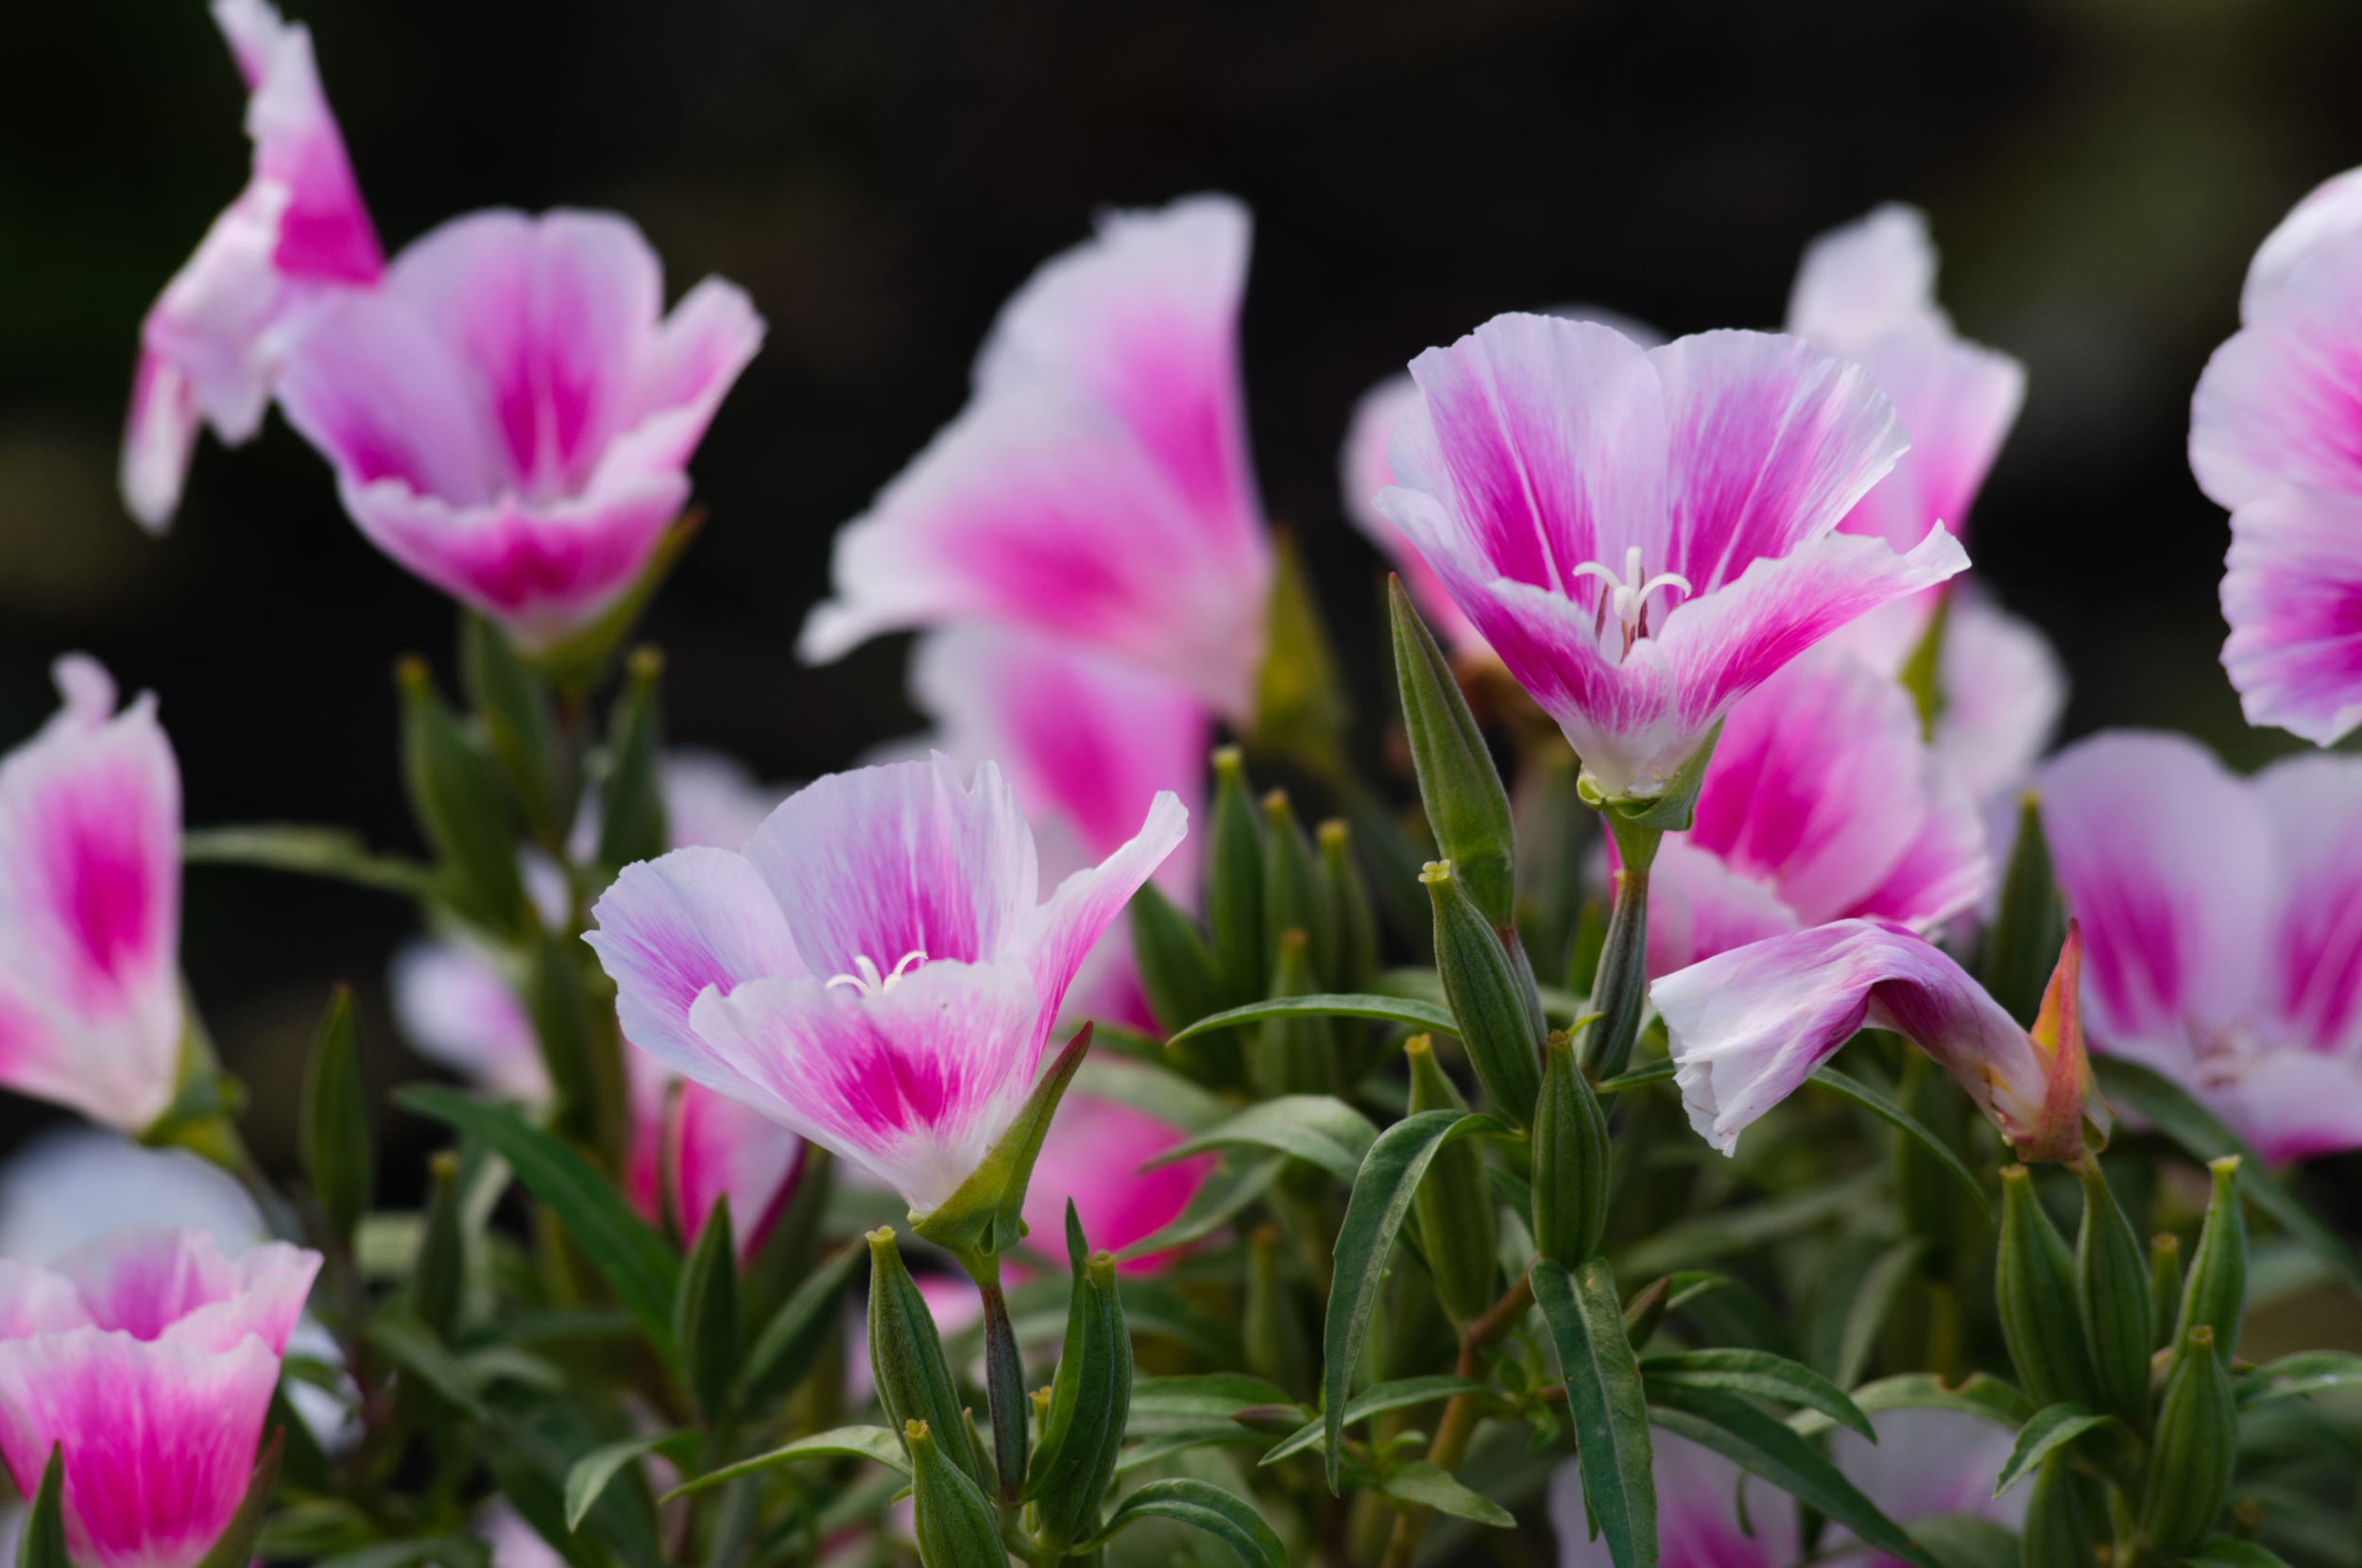 Farewell-to-spring (Clarkia amoena) (2).jpg